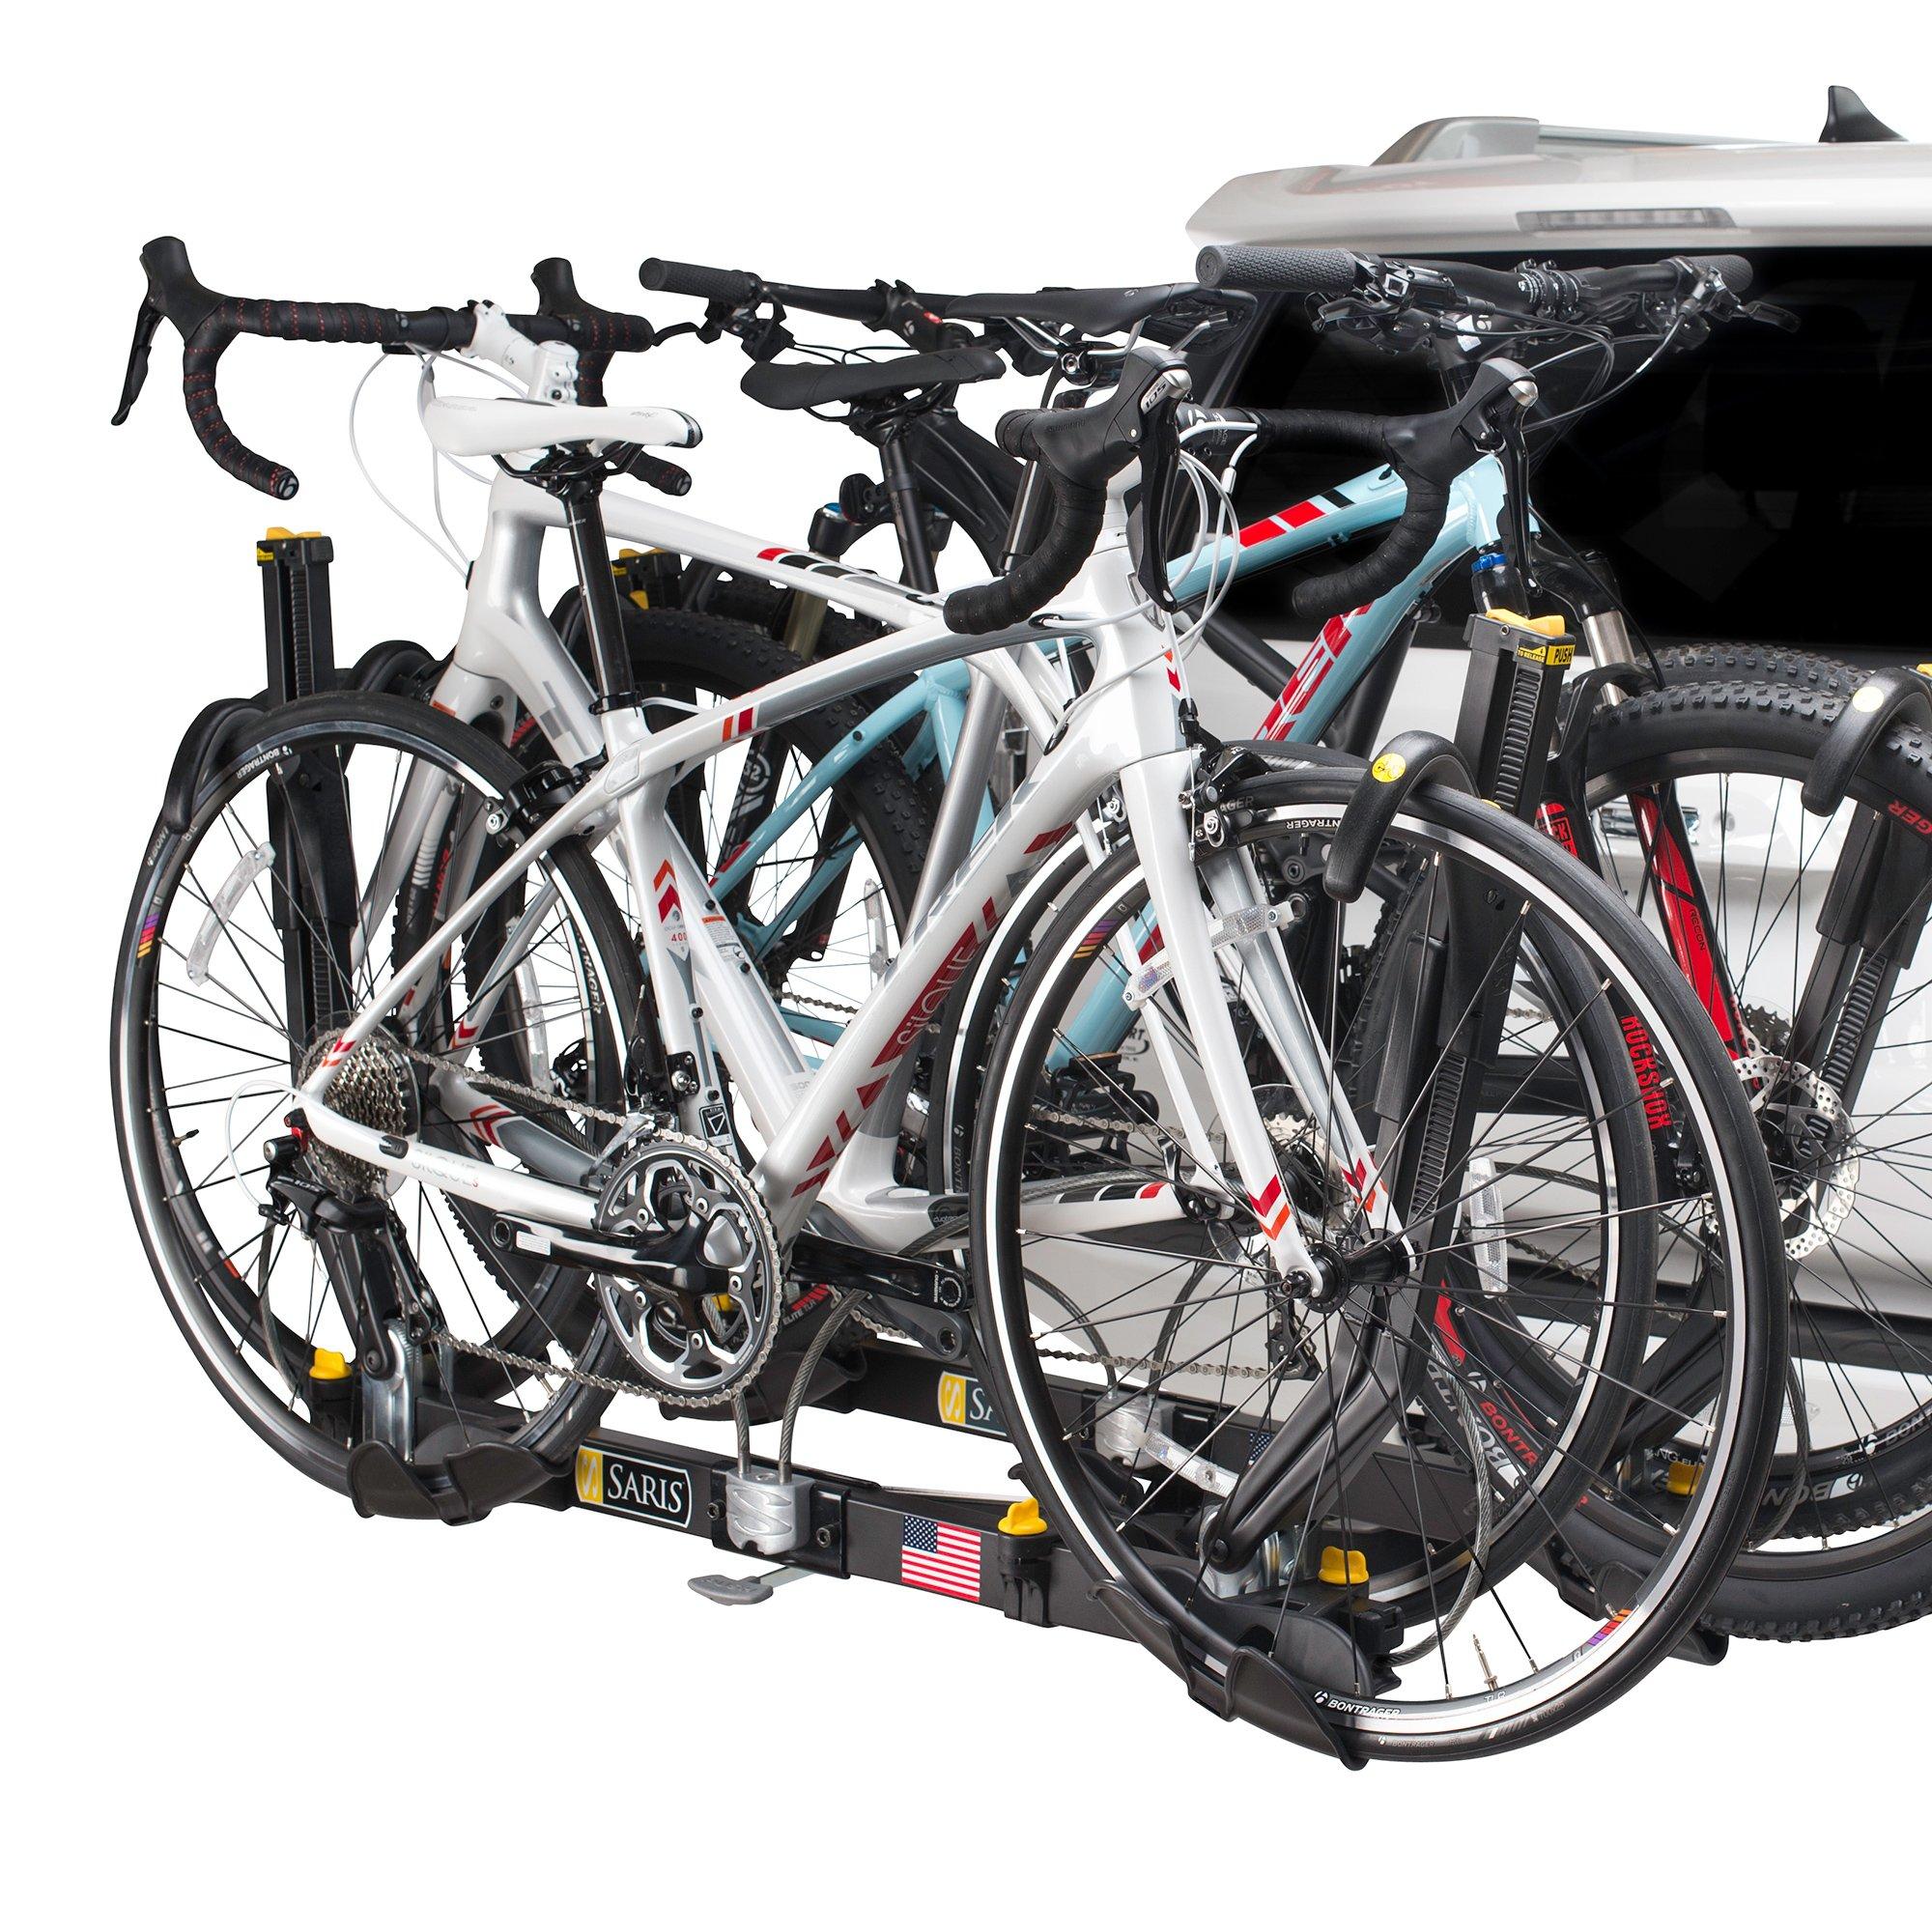 wloc carrier bikes thule shop bike towbar carbox tilt side for velocompact rack